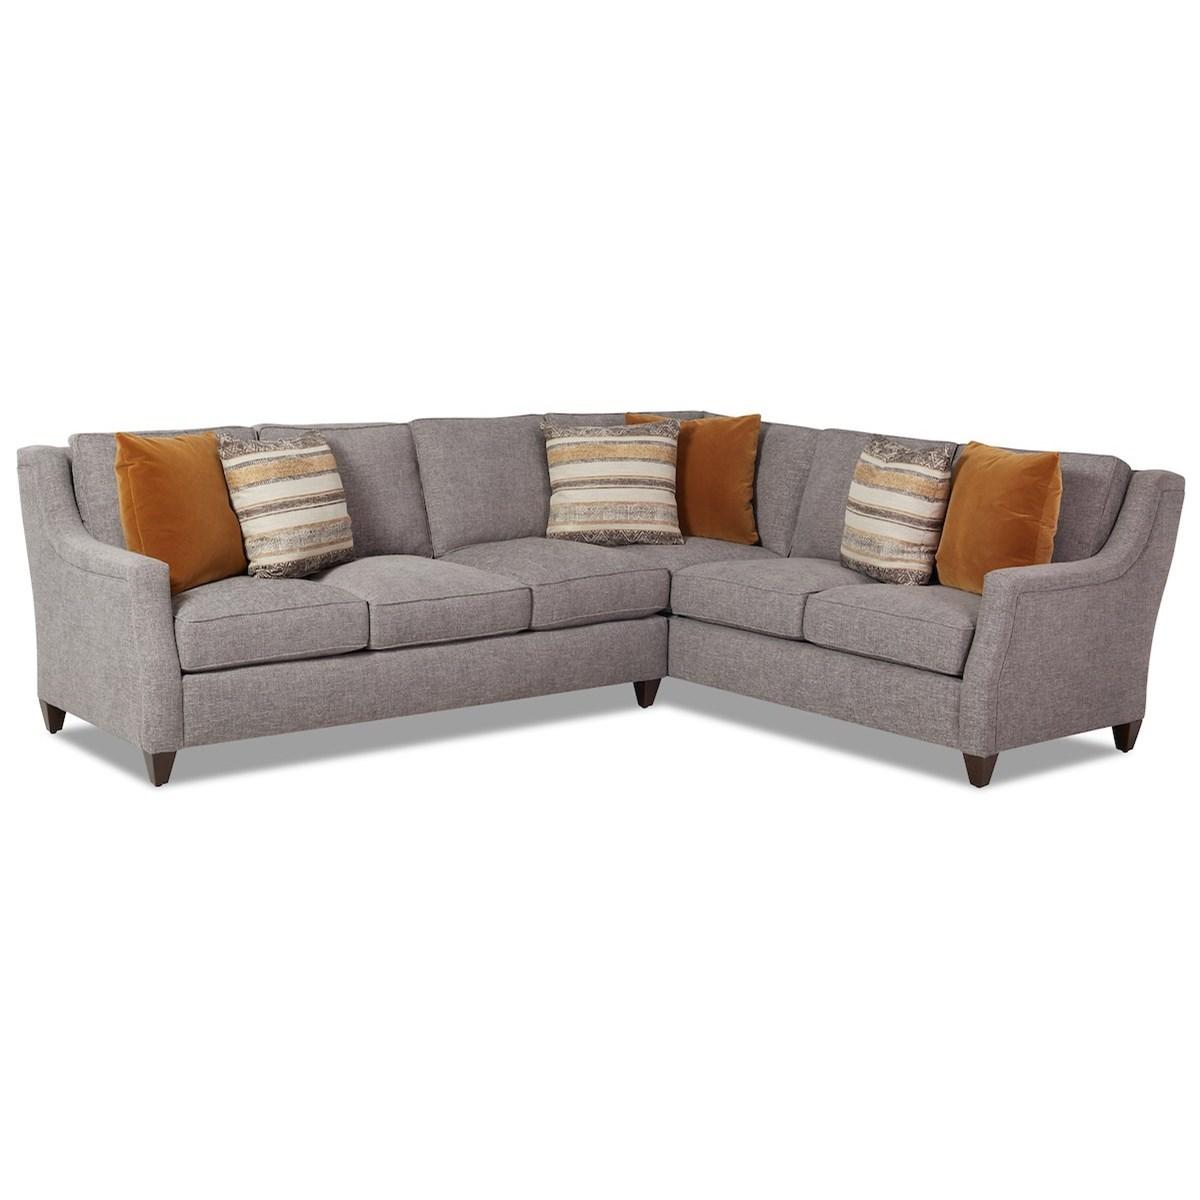 Gemma 5-Seat Sectional Sofa w/ RAF Corner Sofa by Klaussner at Johnny Janosik